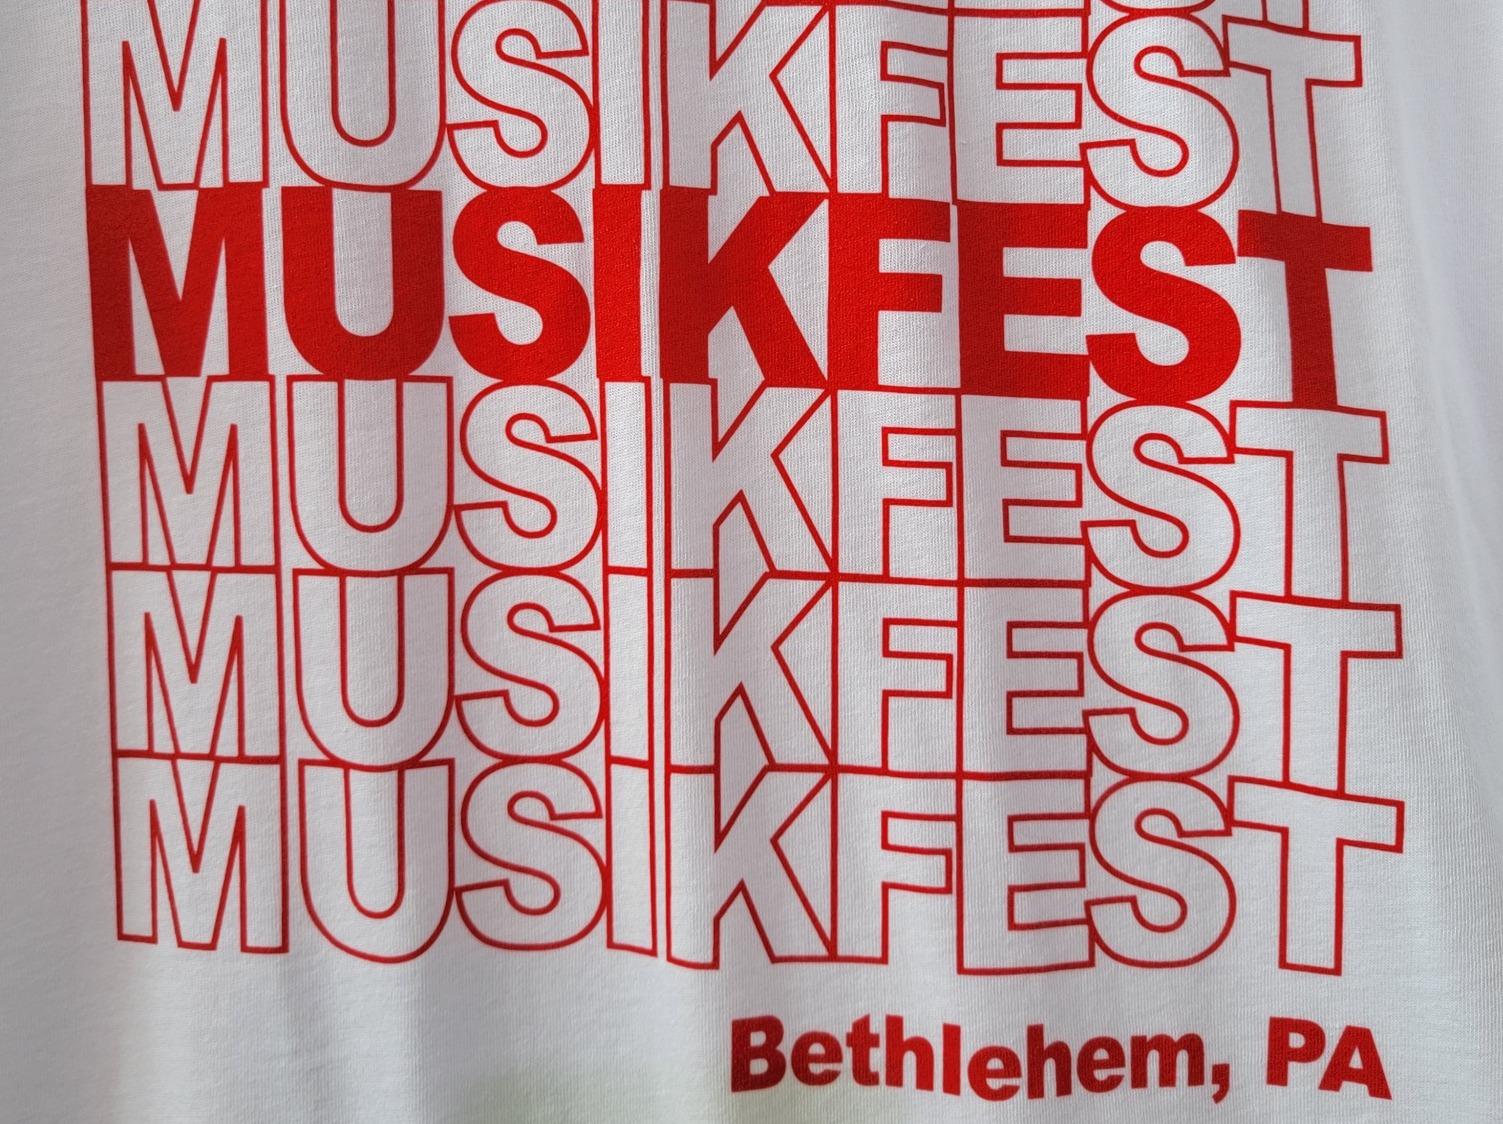 Musikfest Festival PA 2022Musikfest Festival PA 2022